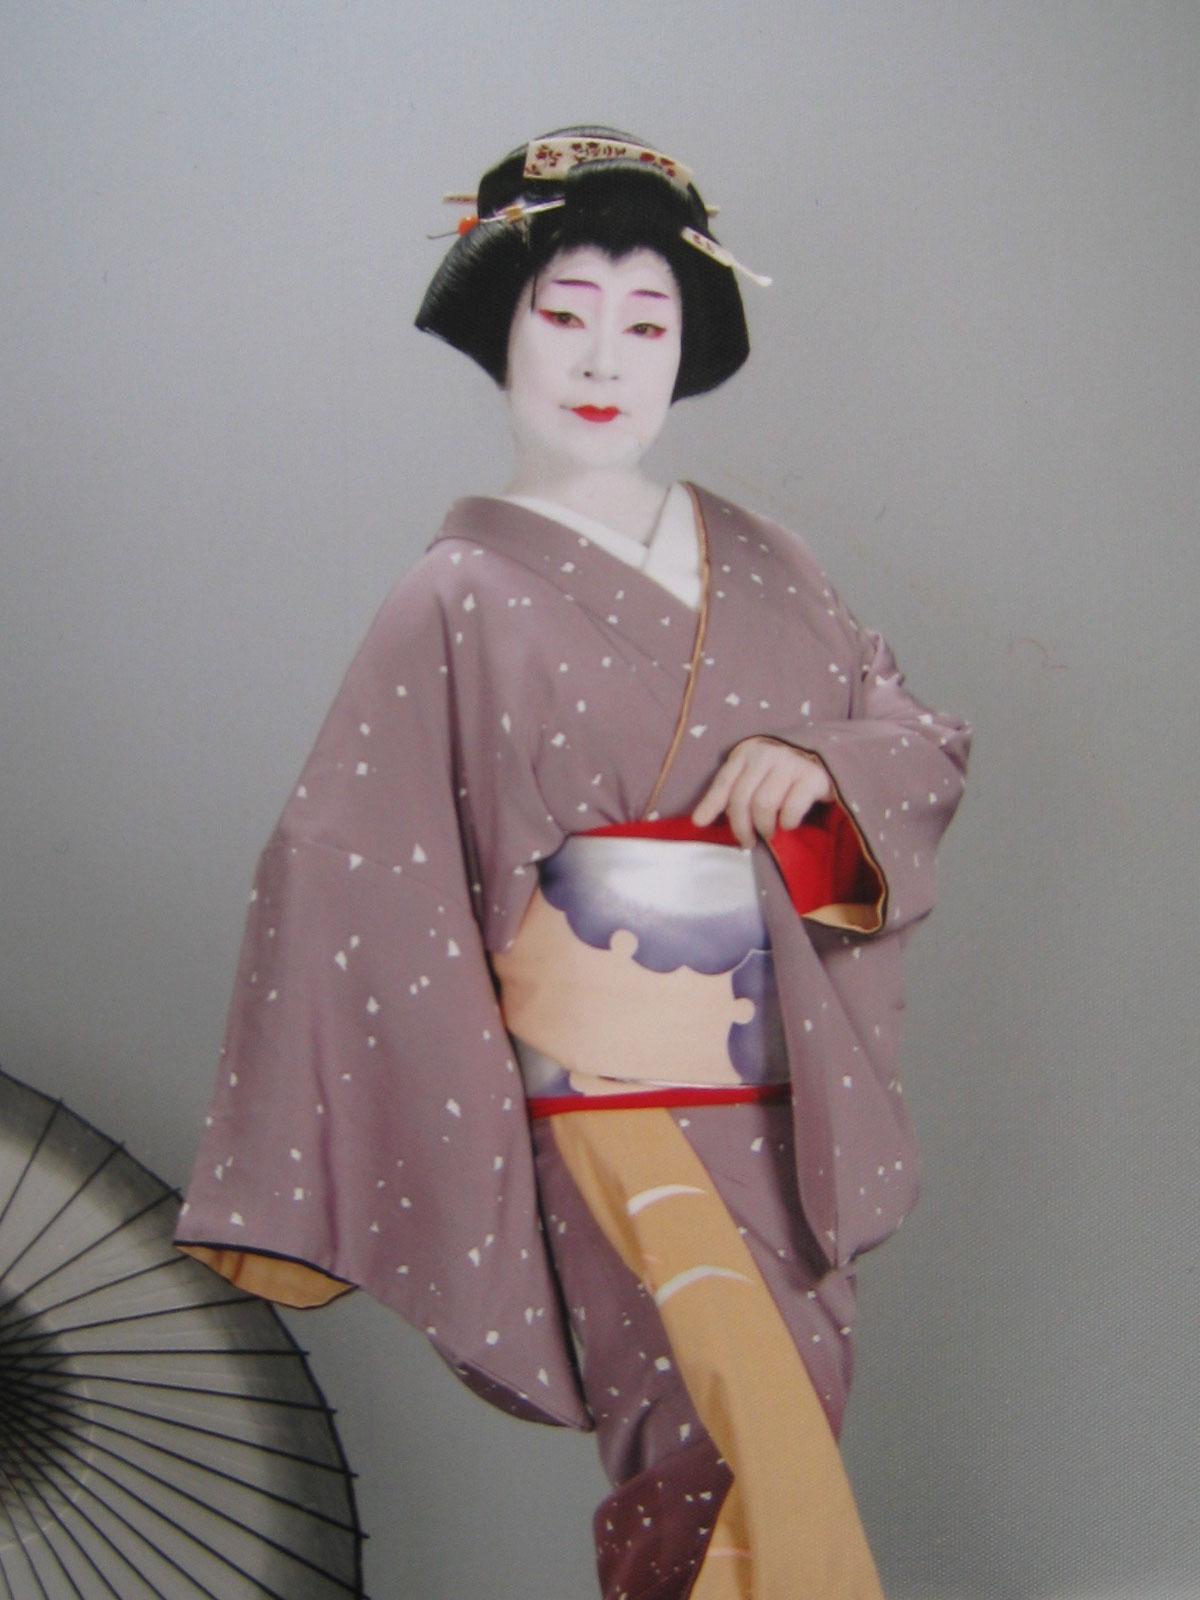 H24.11.18伊丹ホール 伊丹日本舞踊公演 雪の舞い